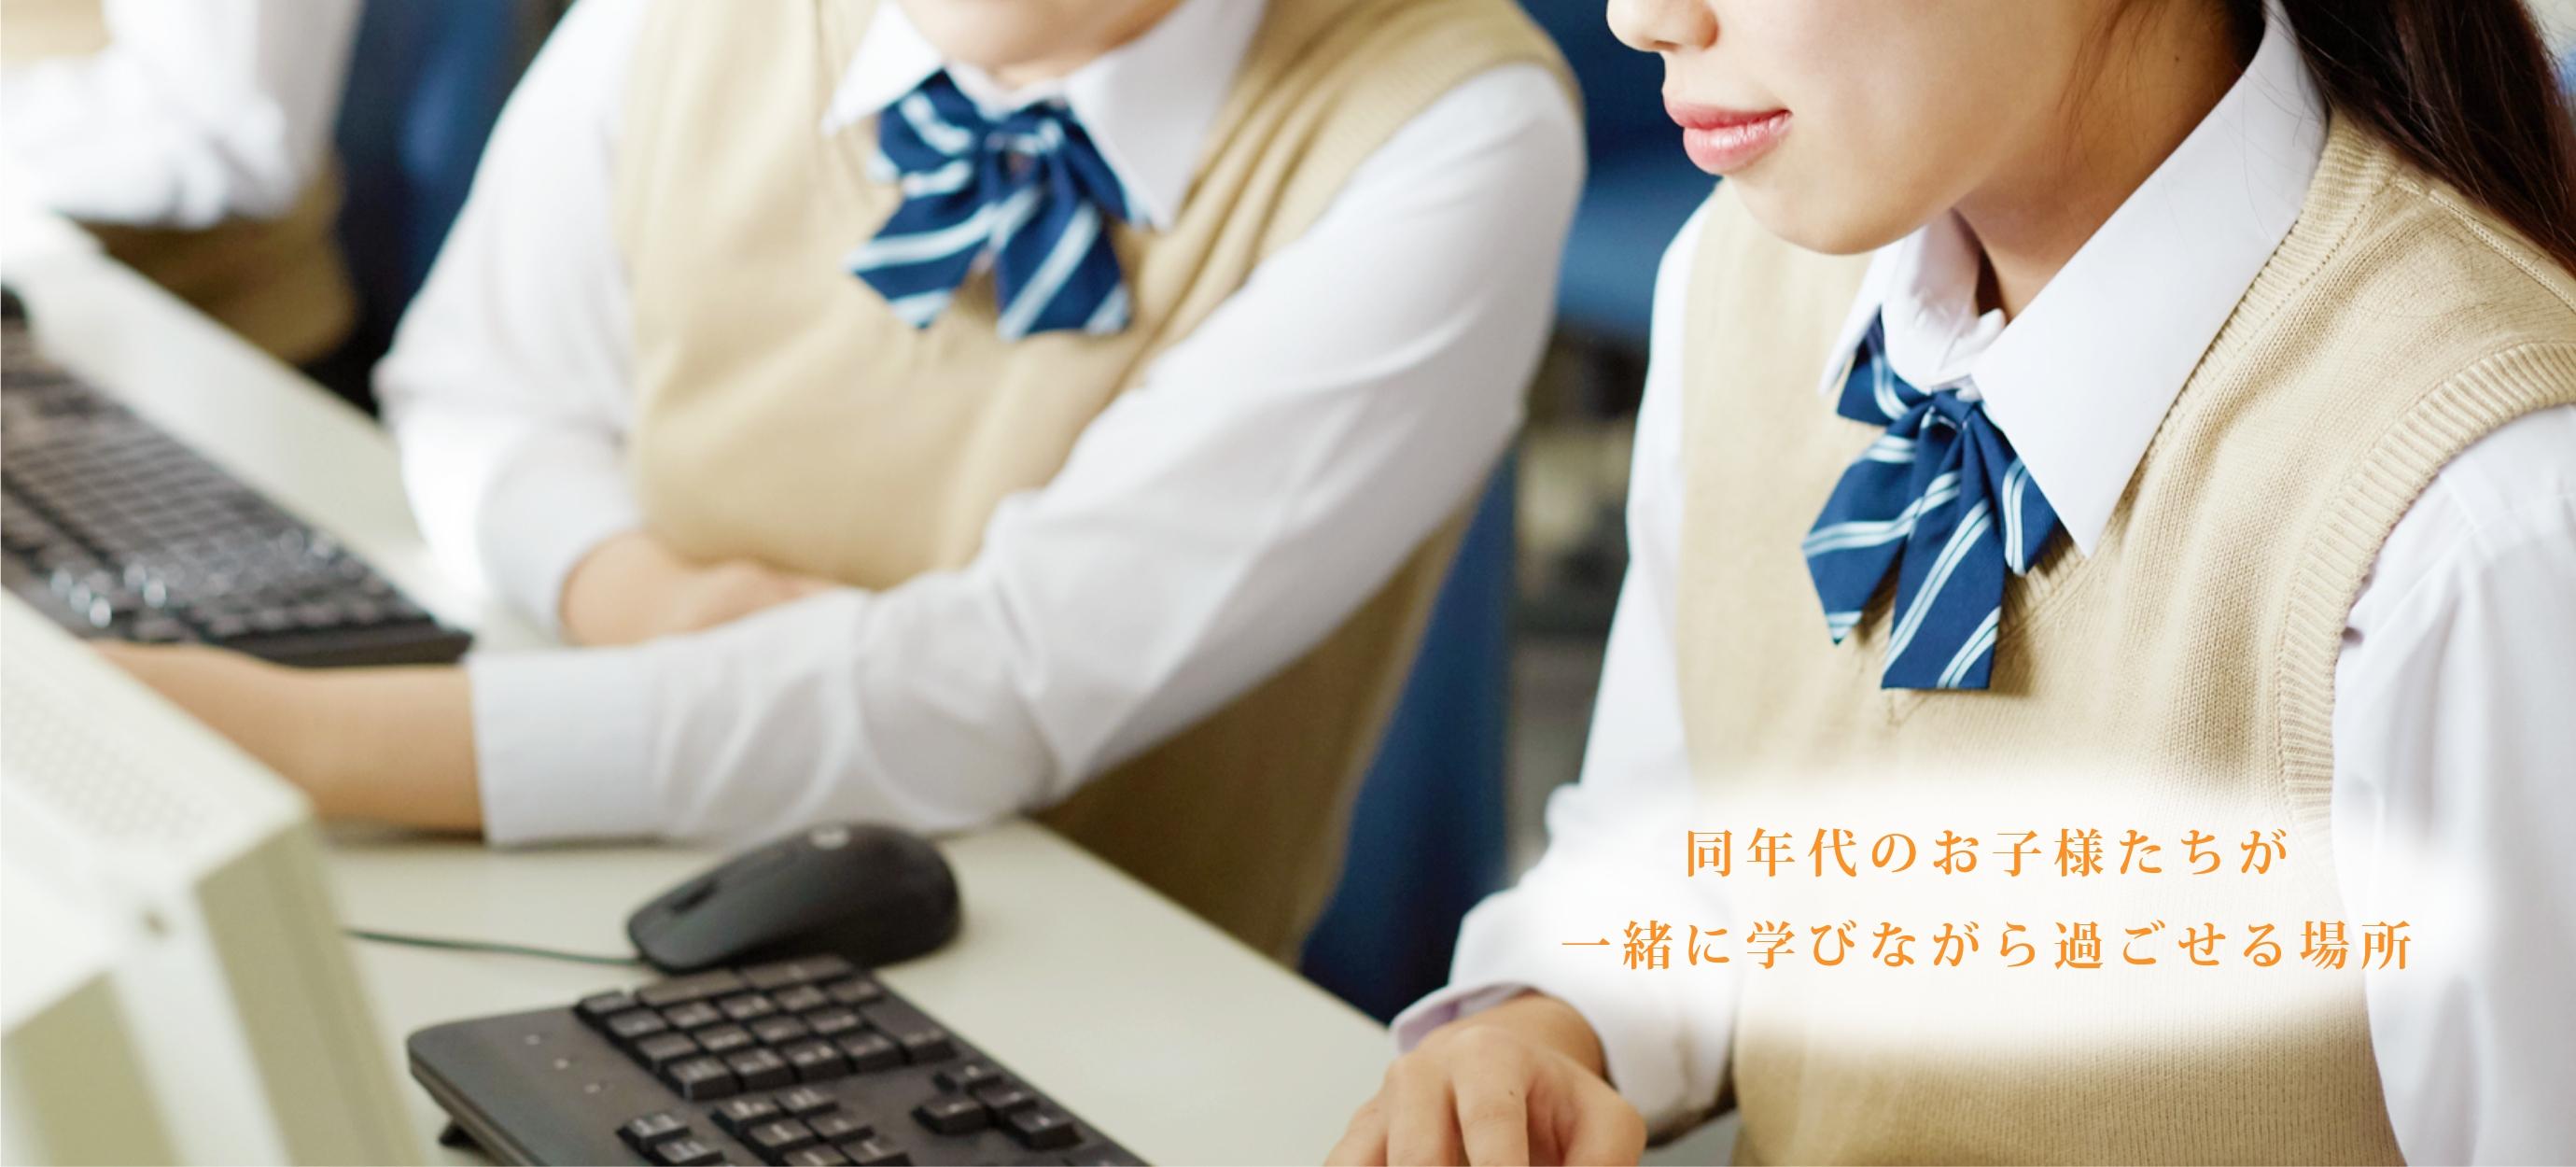 Be Smile College | ビースマイルカレッジ 就労準備型放課後デイサービス 大阪市淀川区